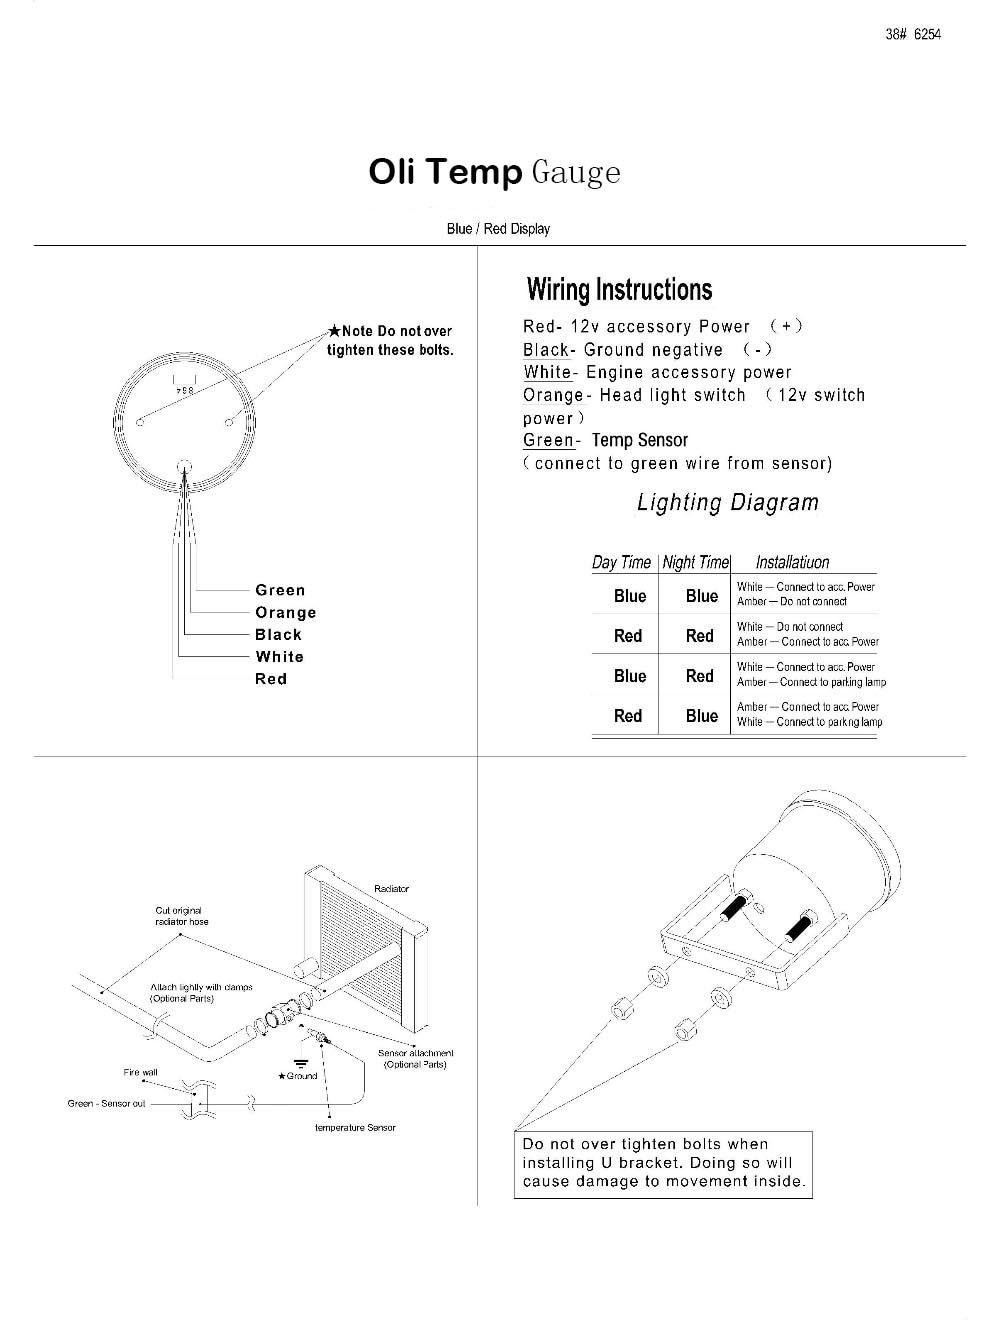 Hook up olie Temp gauge